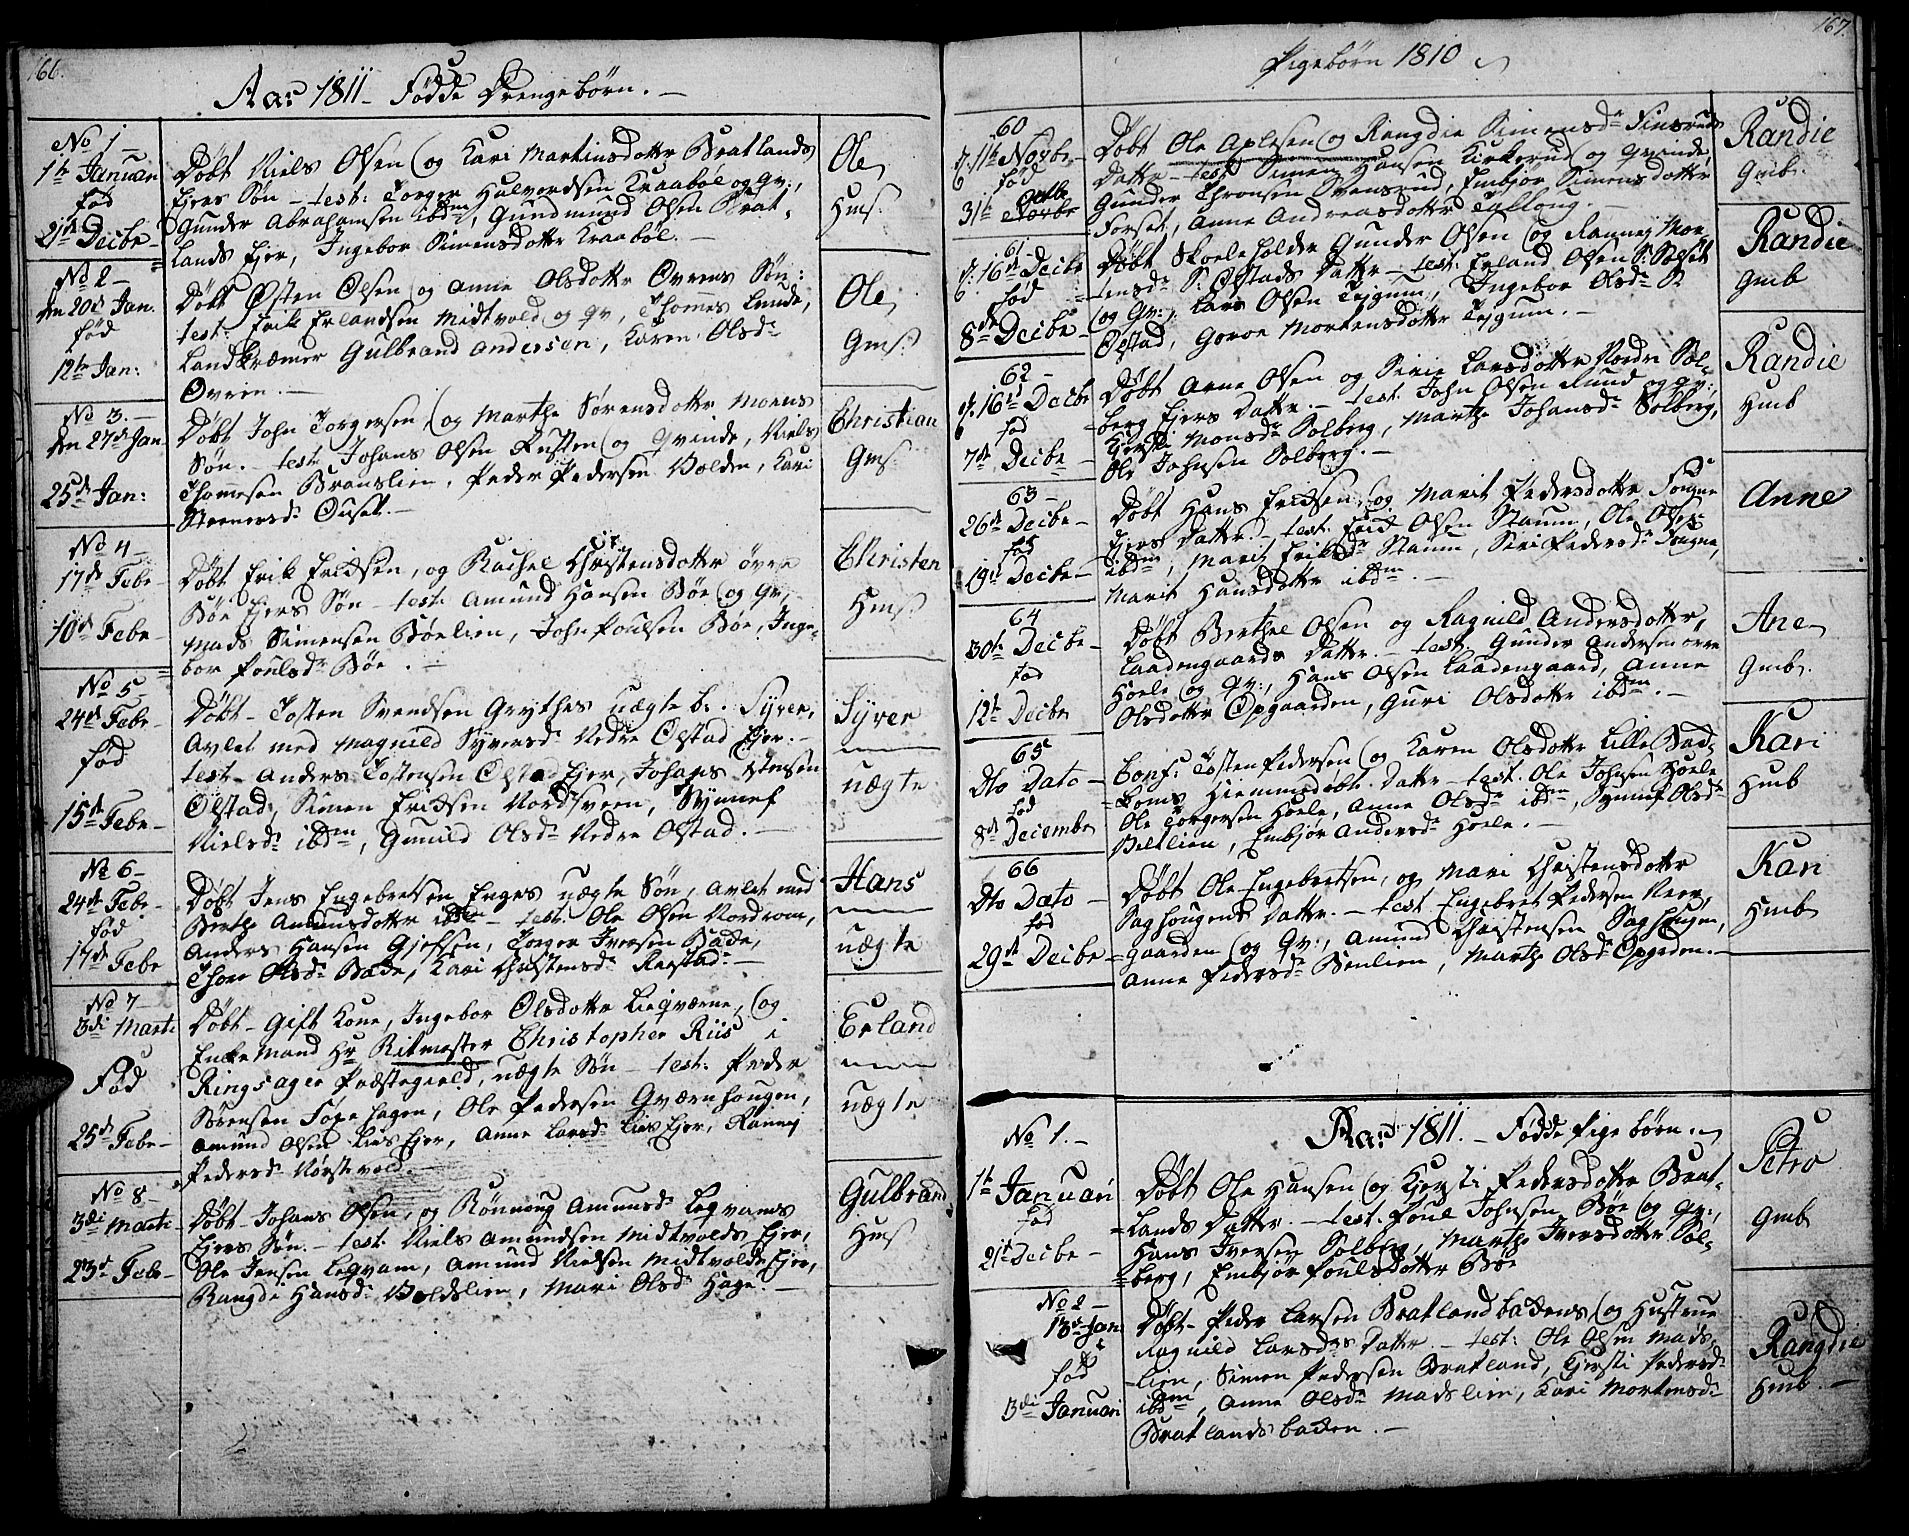 SAH, Gausdal prestekontor, Ministerialbok nr. 4, 1809-1817, s. 166-167